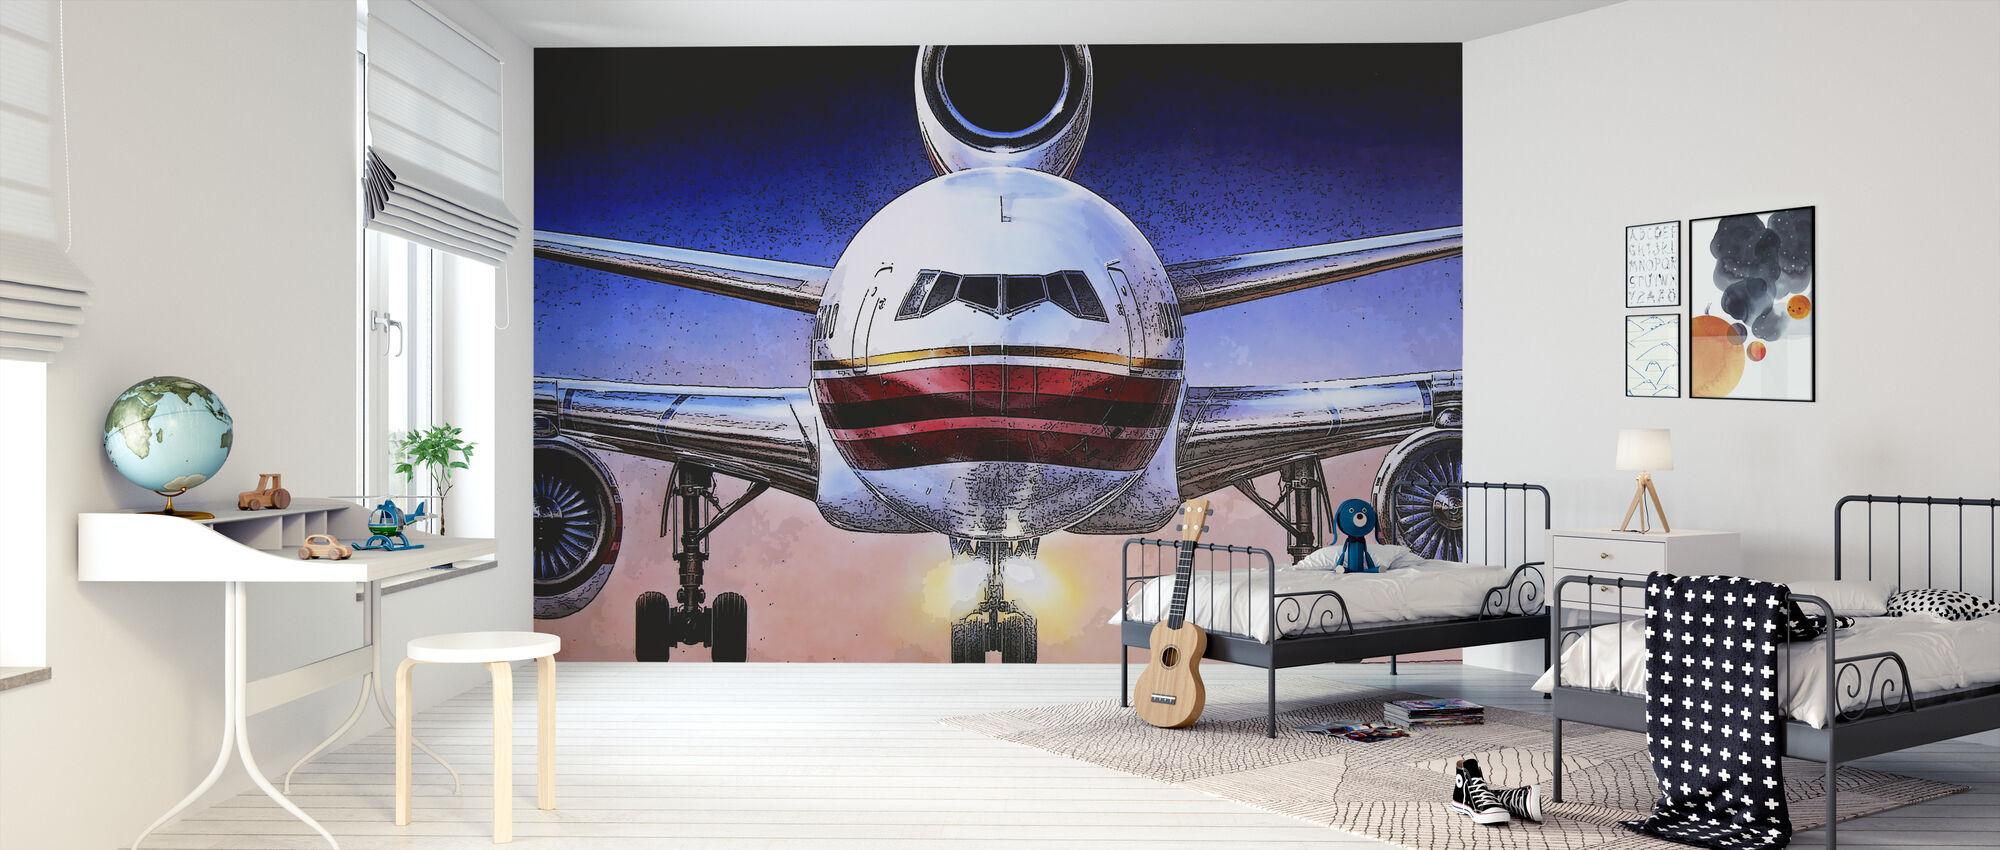 Airbus-juliste - Tapetti - Lastenhuone